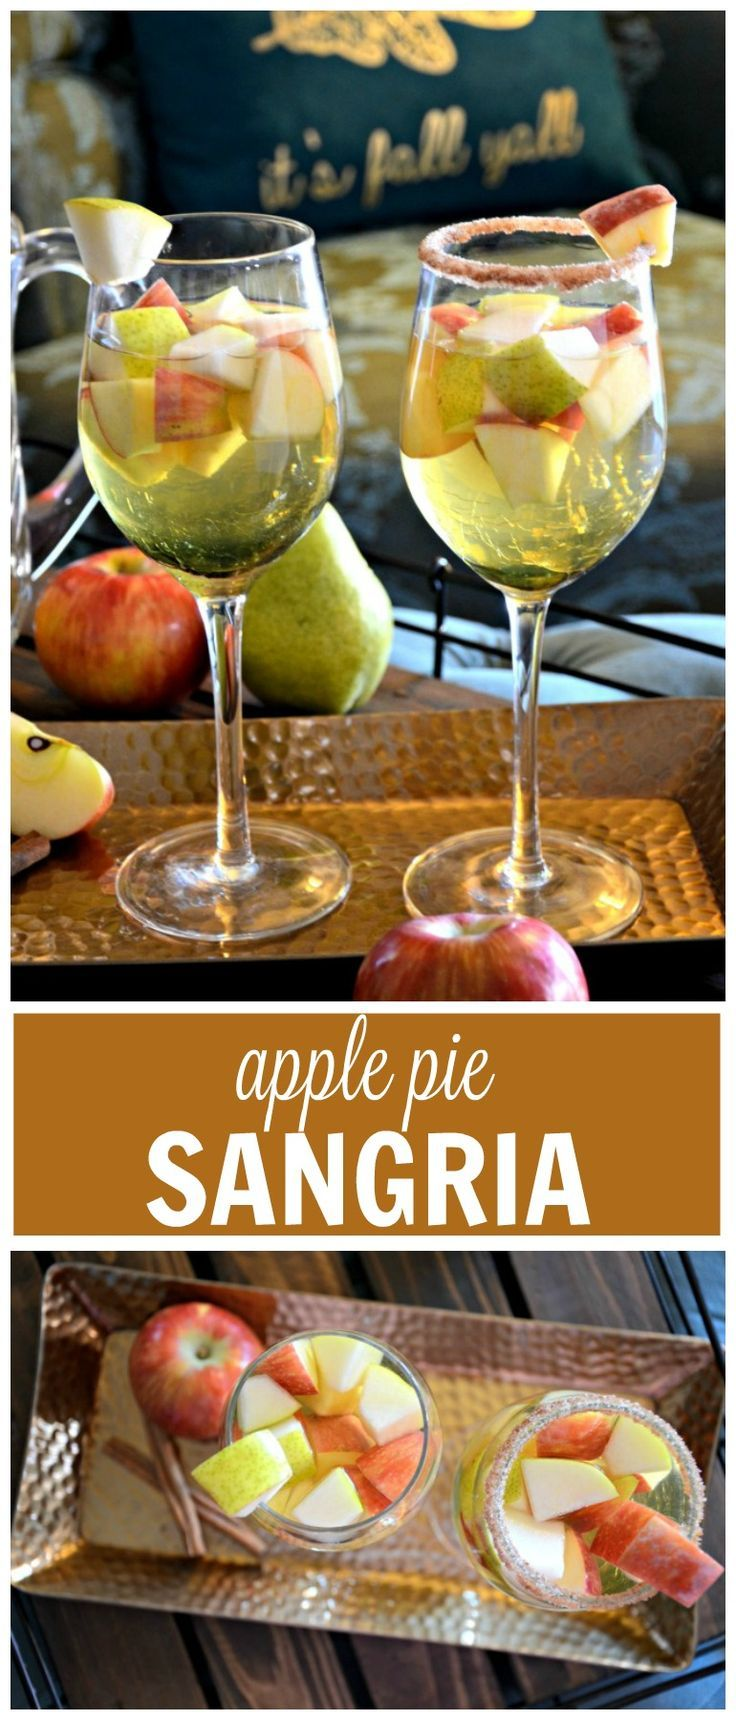 Small Crop Of Apple Pie Sangria